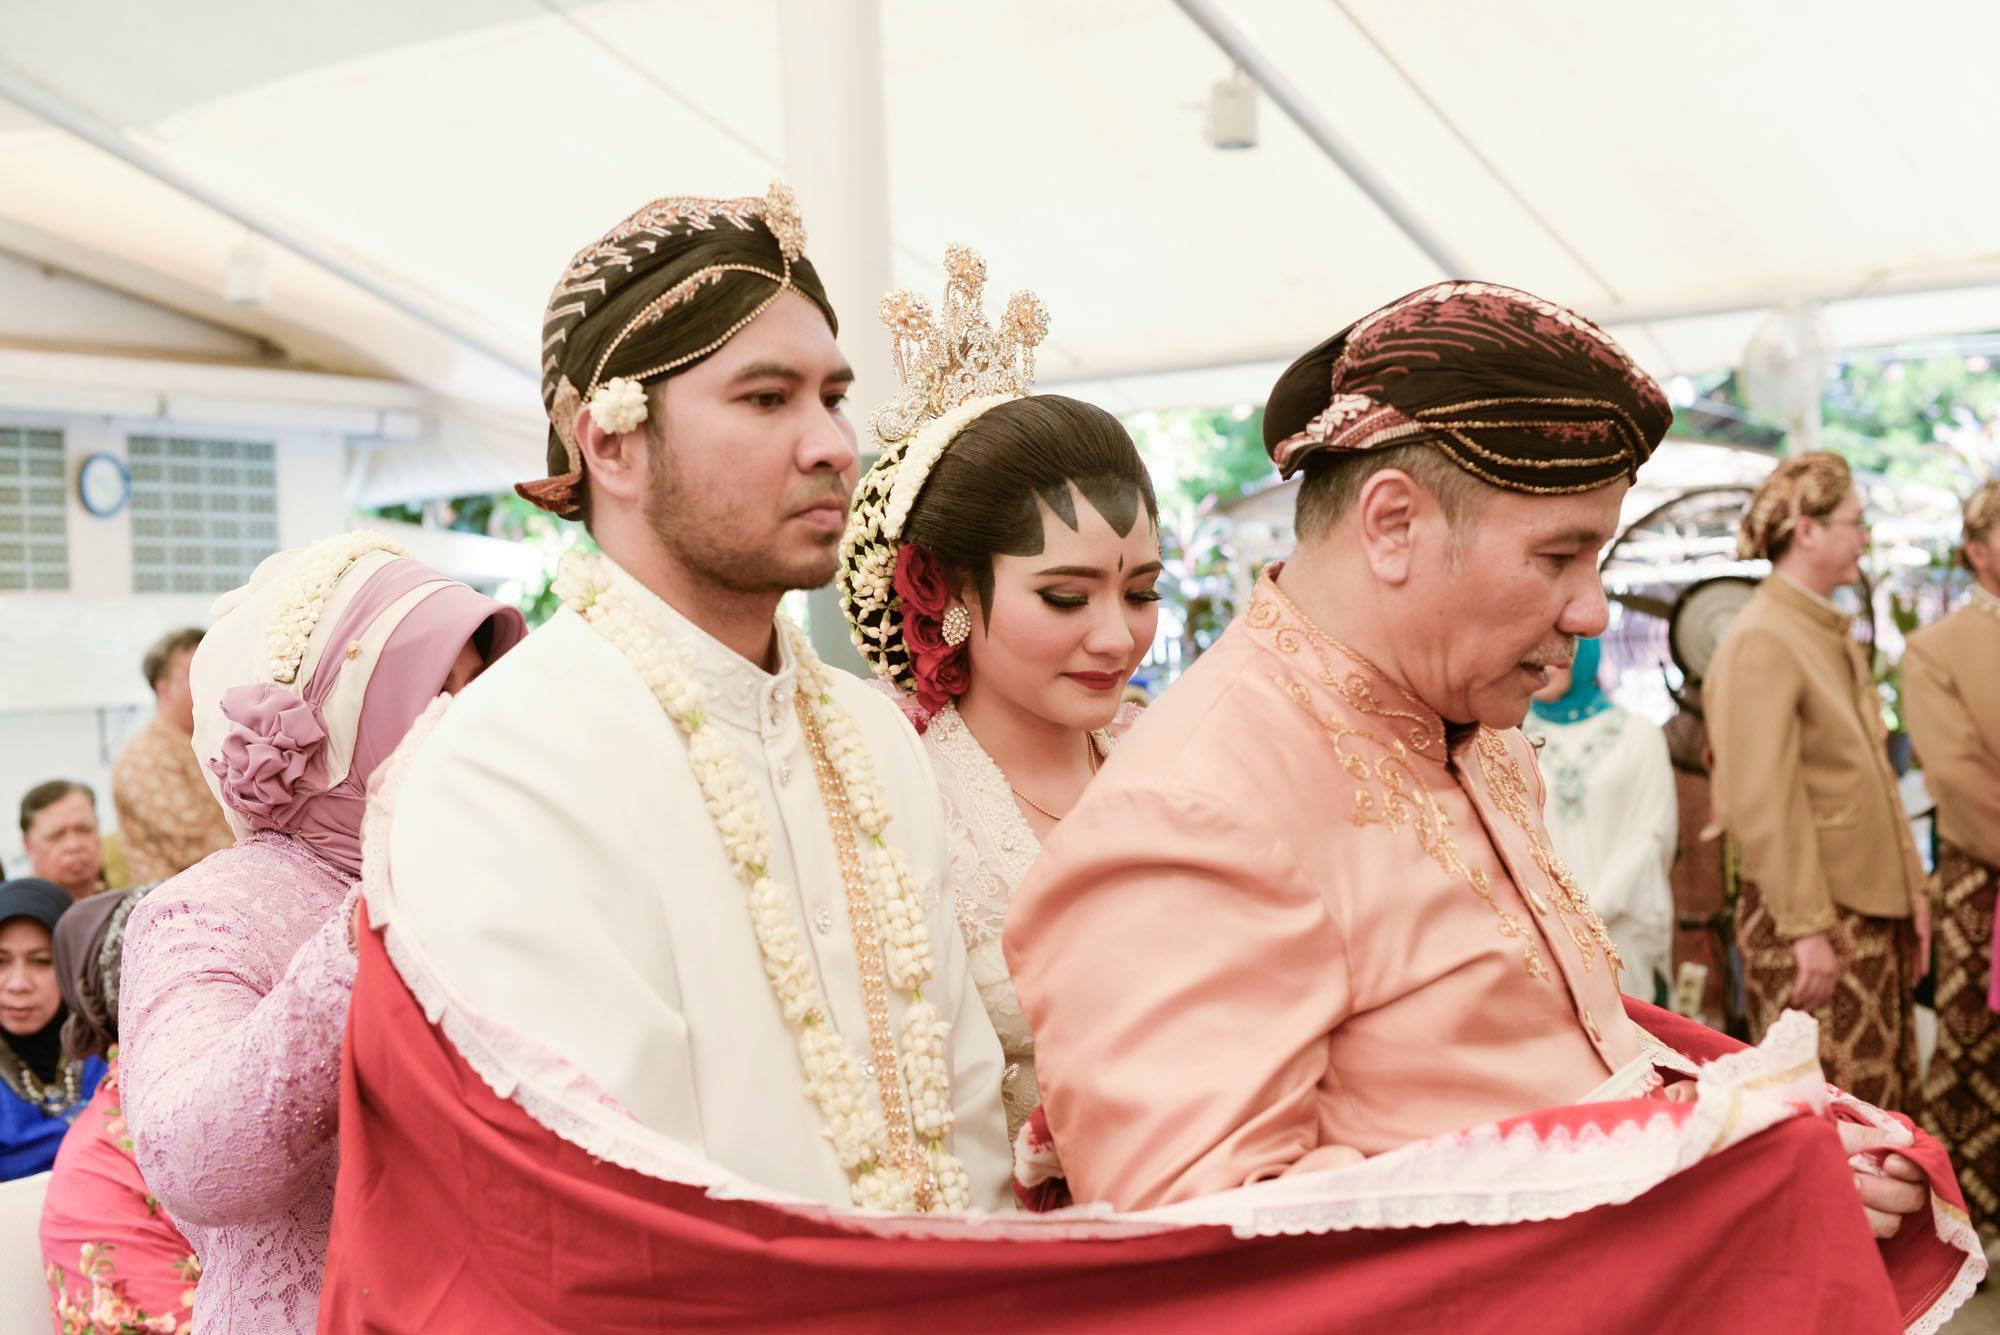 11 Prosesi Pernikahan Adat Jawa Ini Dinilai Ribet, Padahal Punya Makna yang Indah Lho!